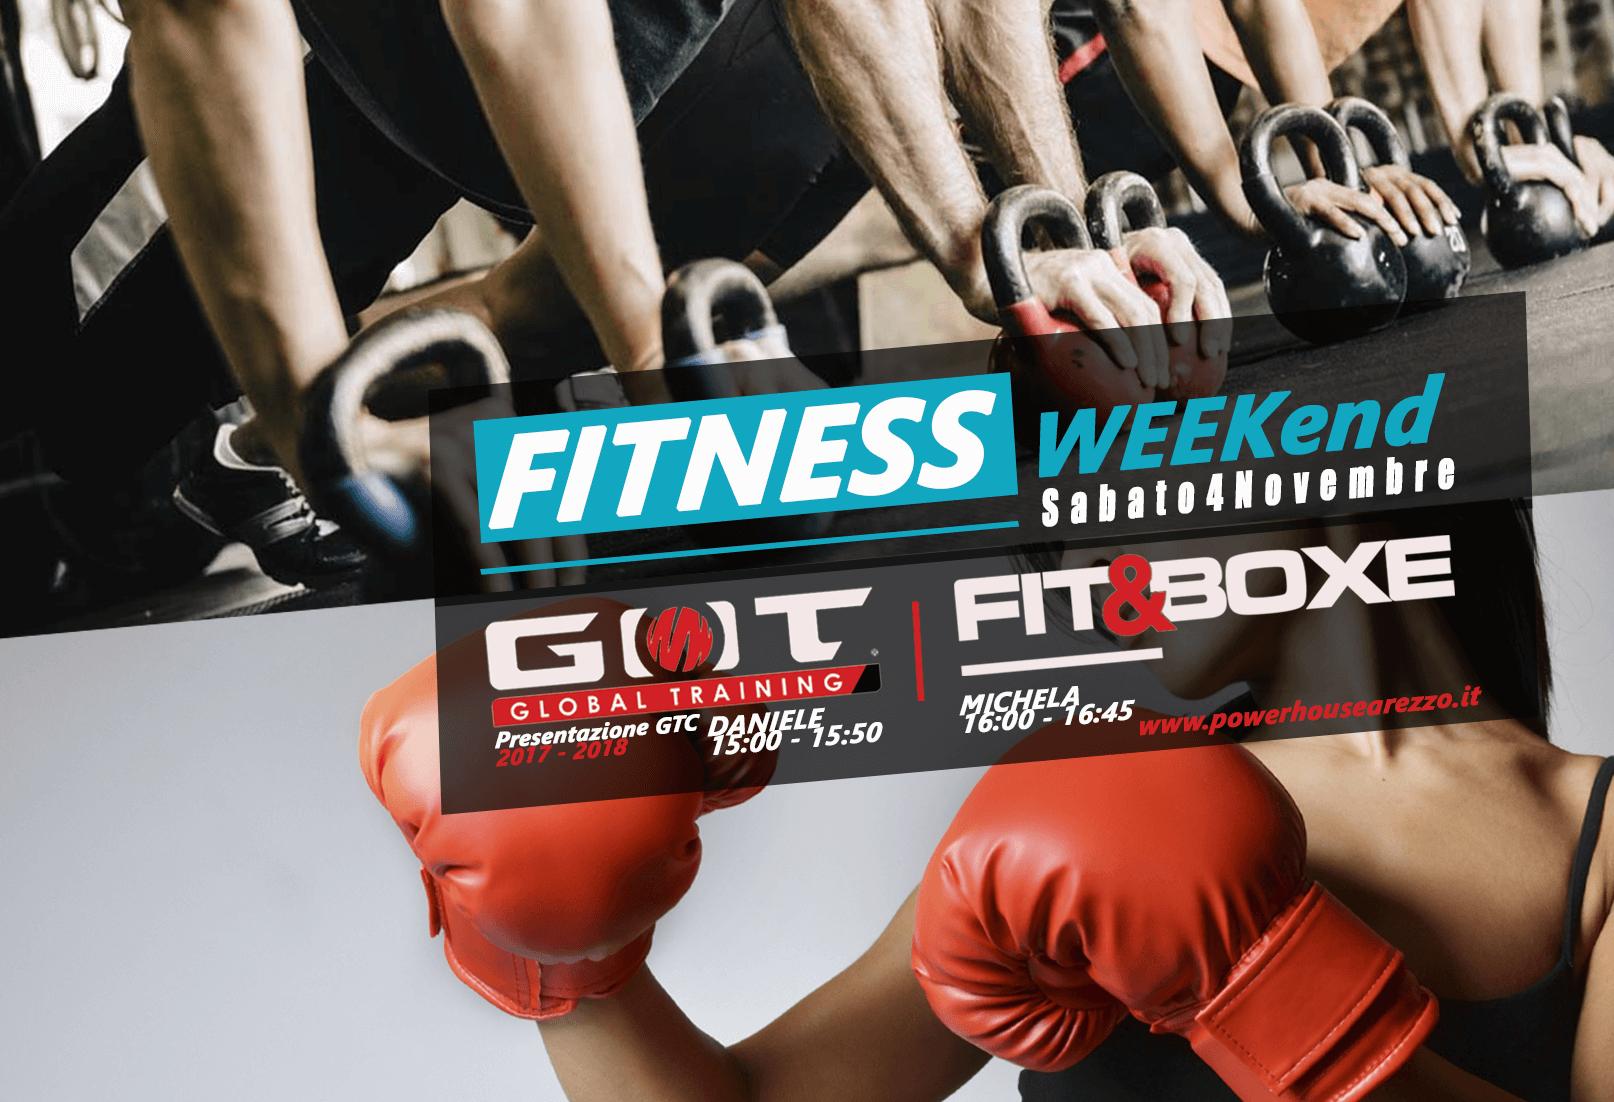 Fitness Weekend